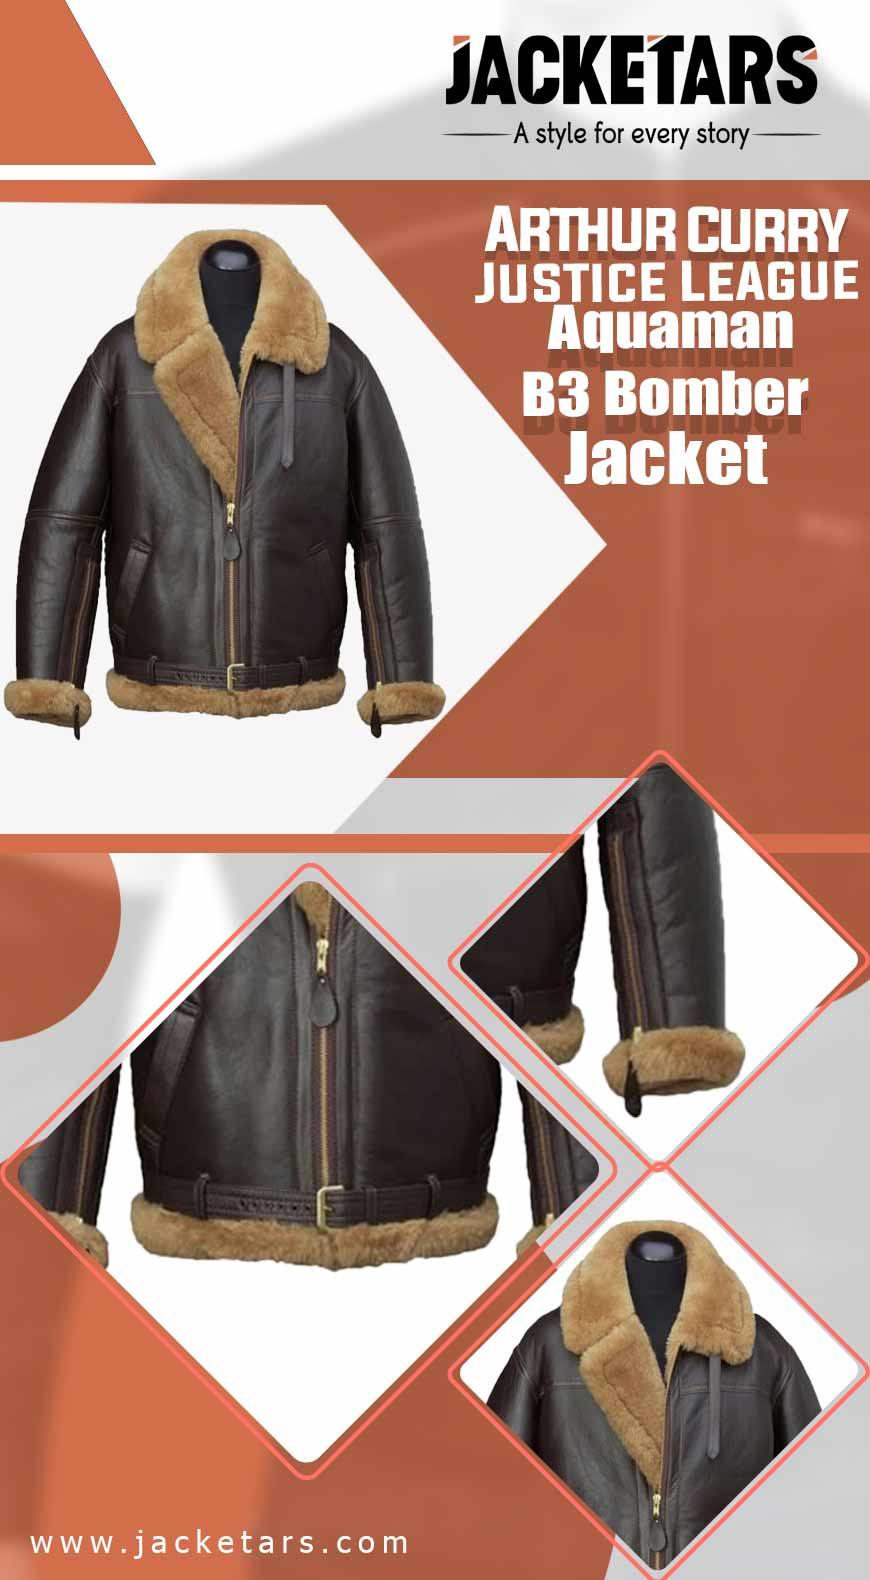 Arthur Curry Justice League Aquaman B3 Bomber Jacket info